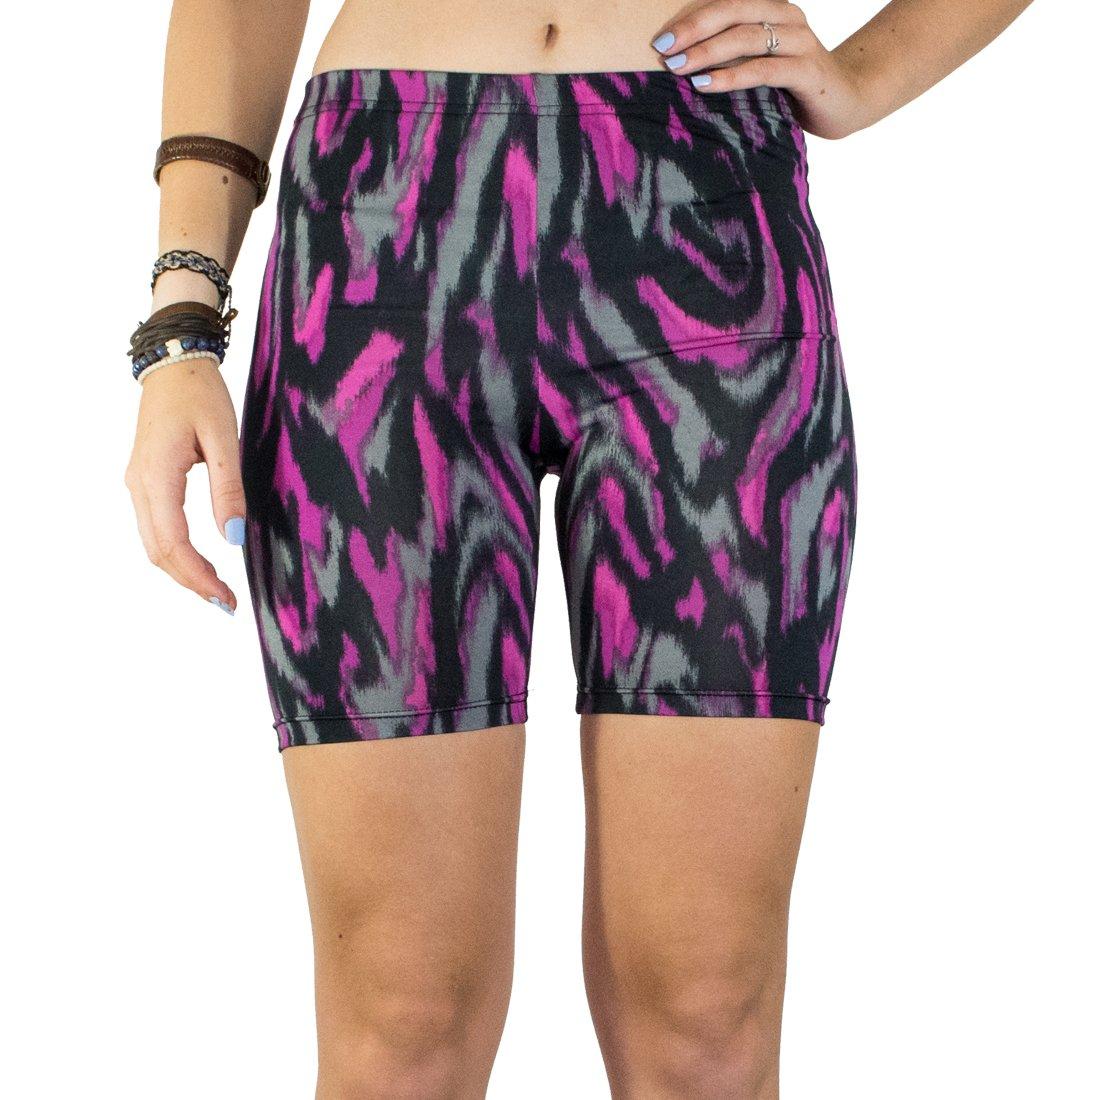 Booties, Women's Breathable Yoga Exercise Swim Party Shorts :: Fuchsia City